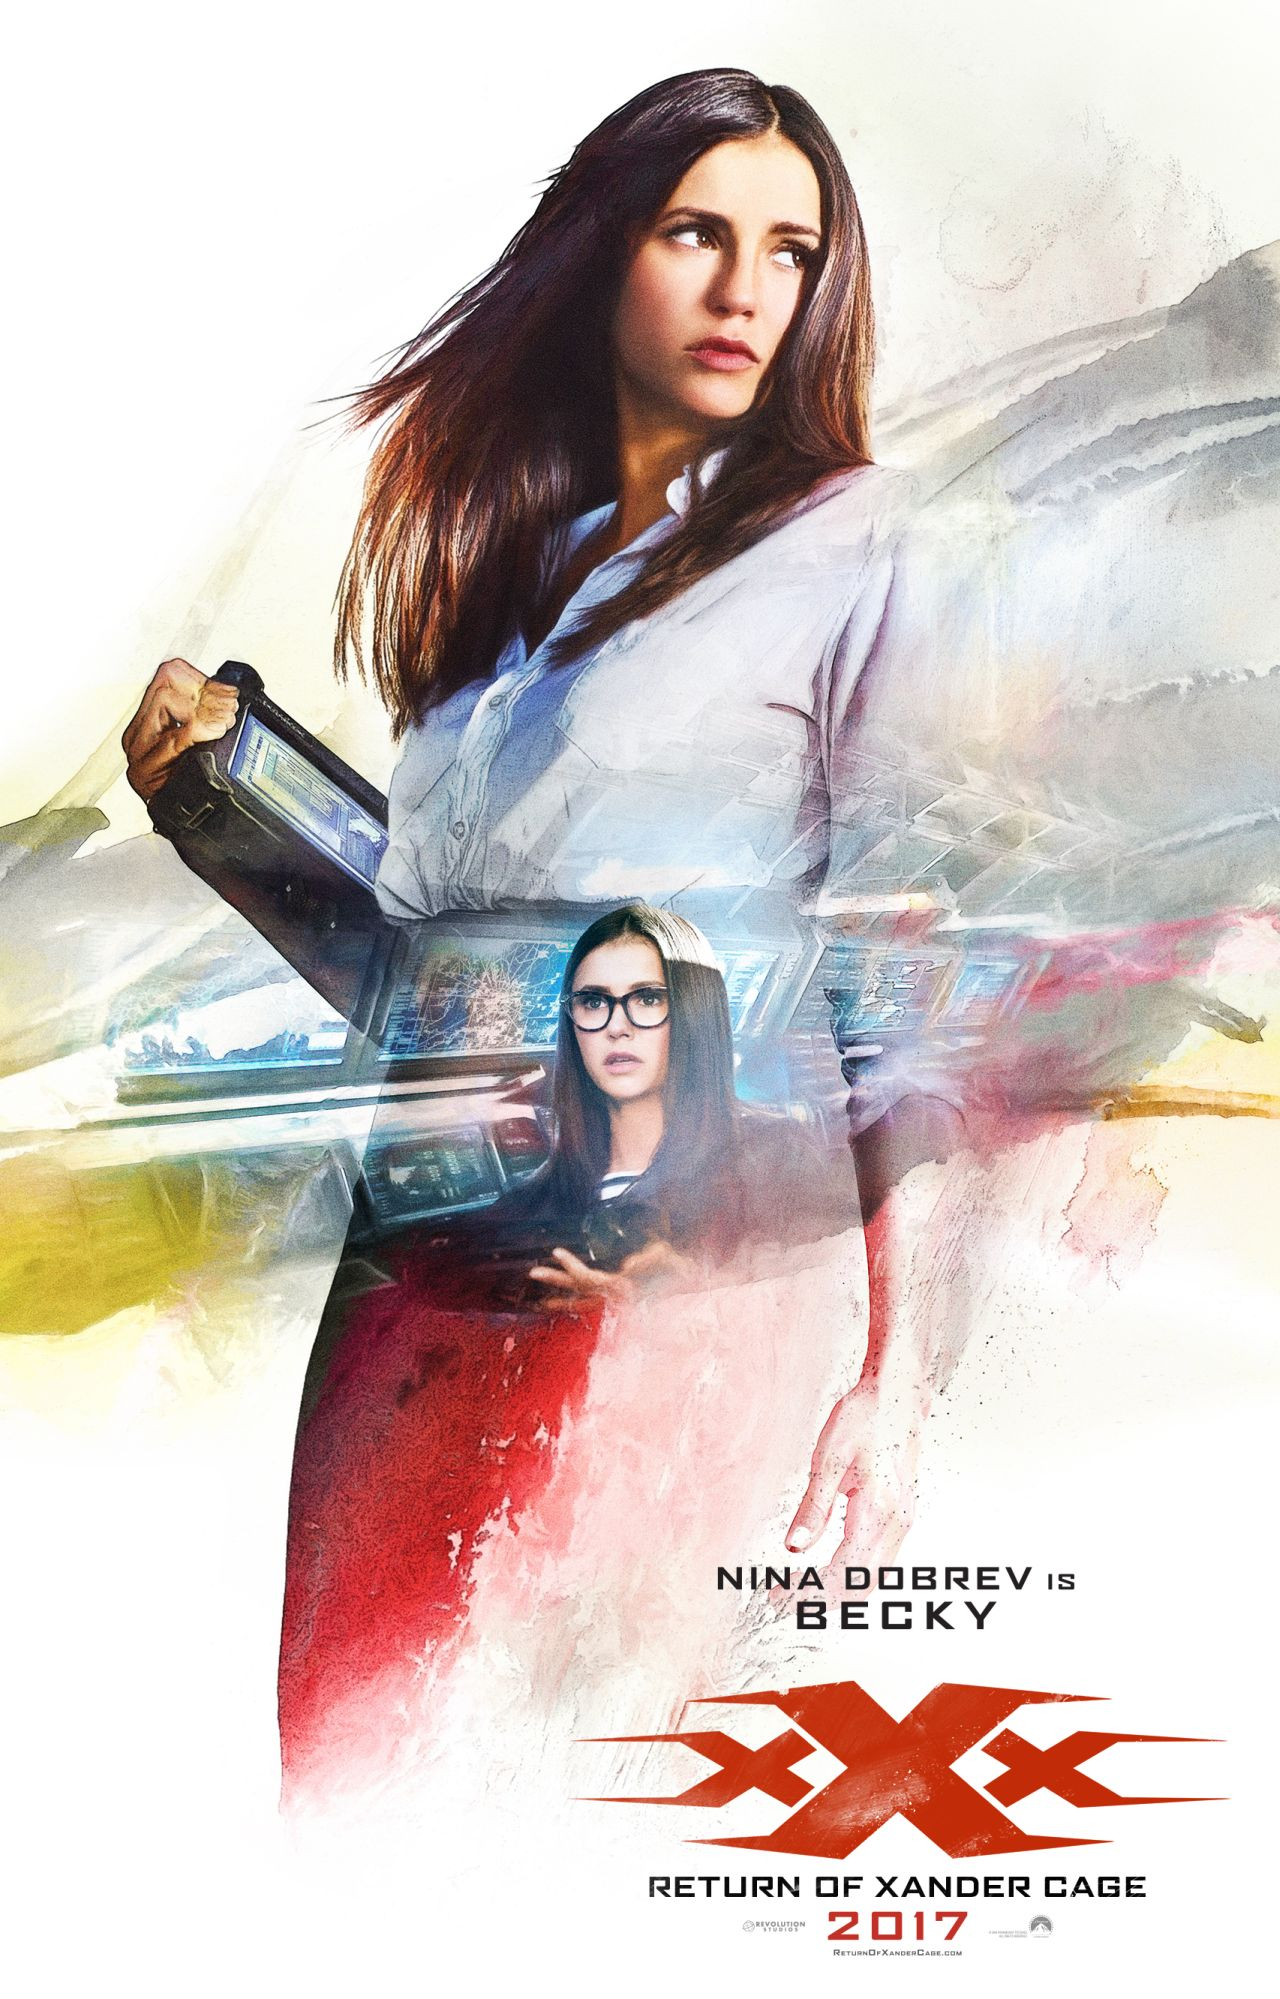 xXx: Return of Xander Cage - Il character poster di Nina Dobrev